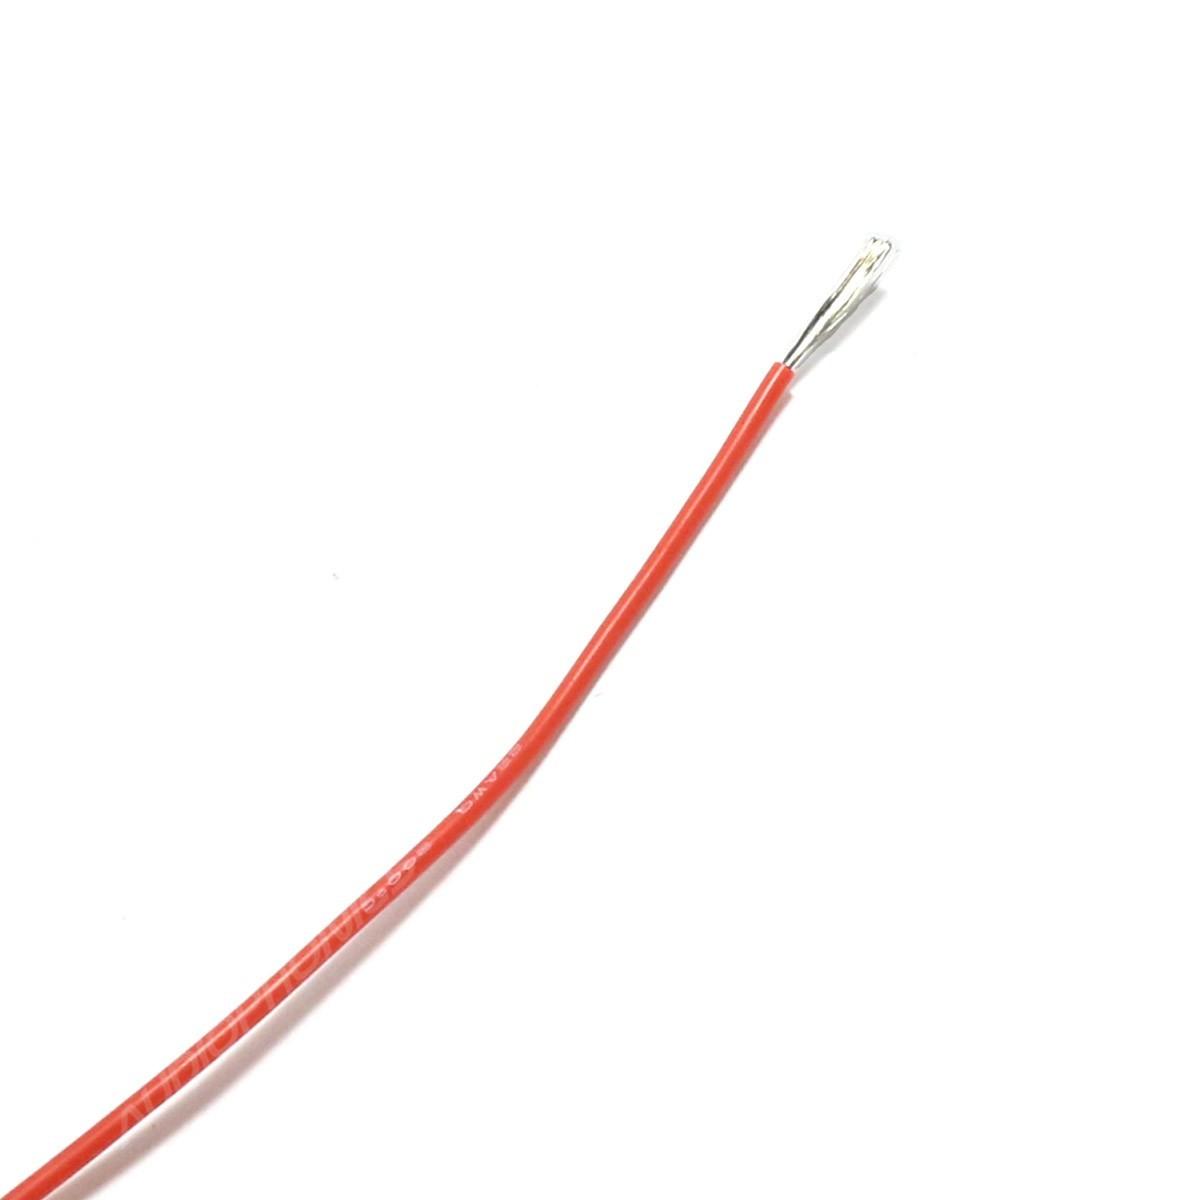 Fil de câblage multibrins silicone 22AWG 0.33mm² (Rouge)